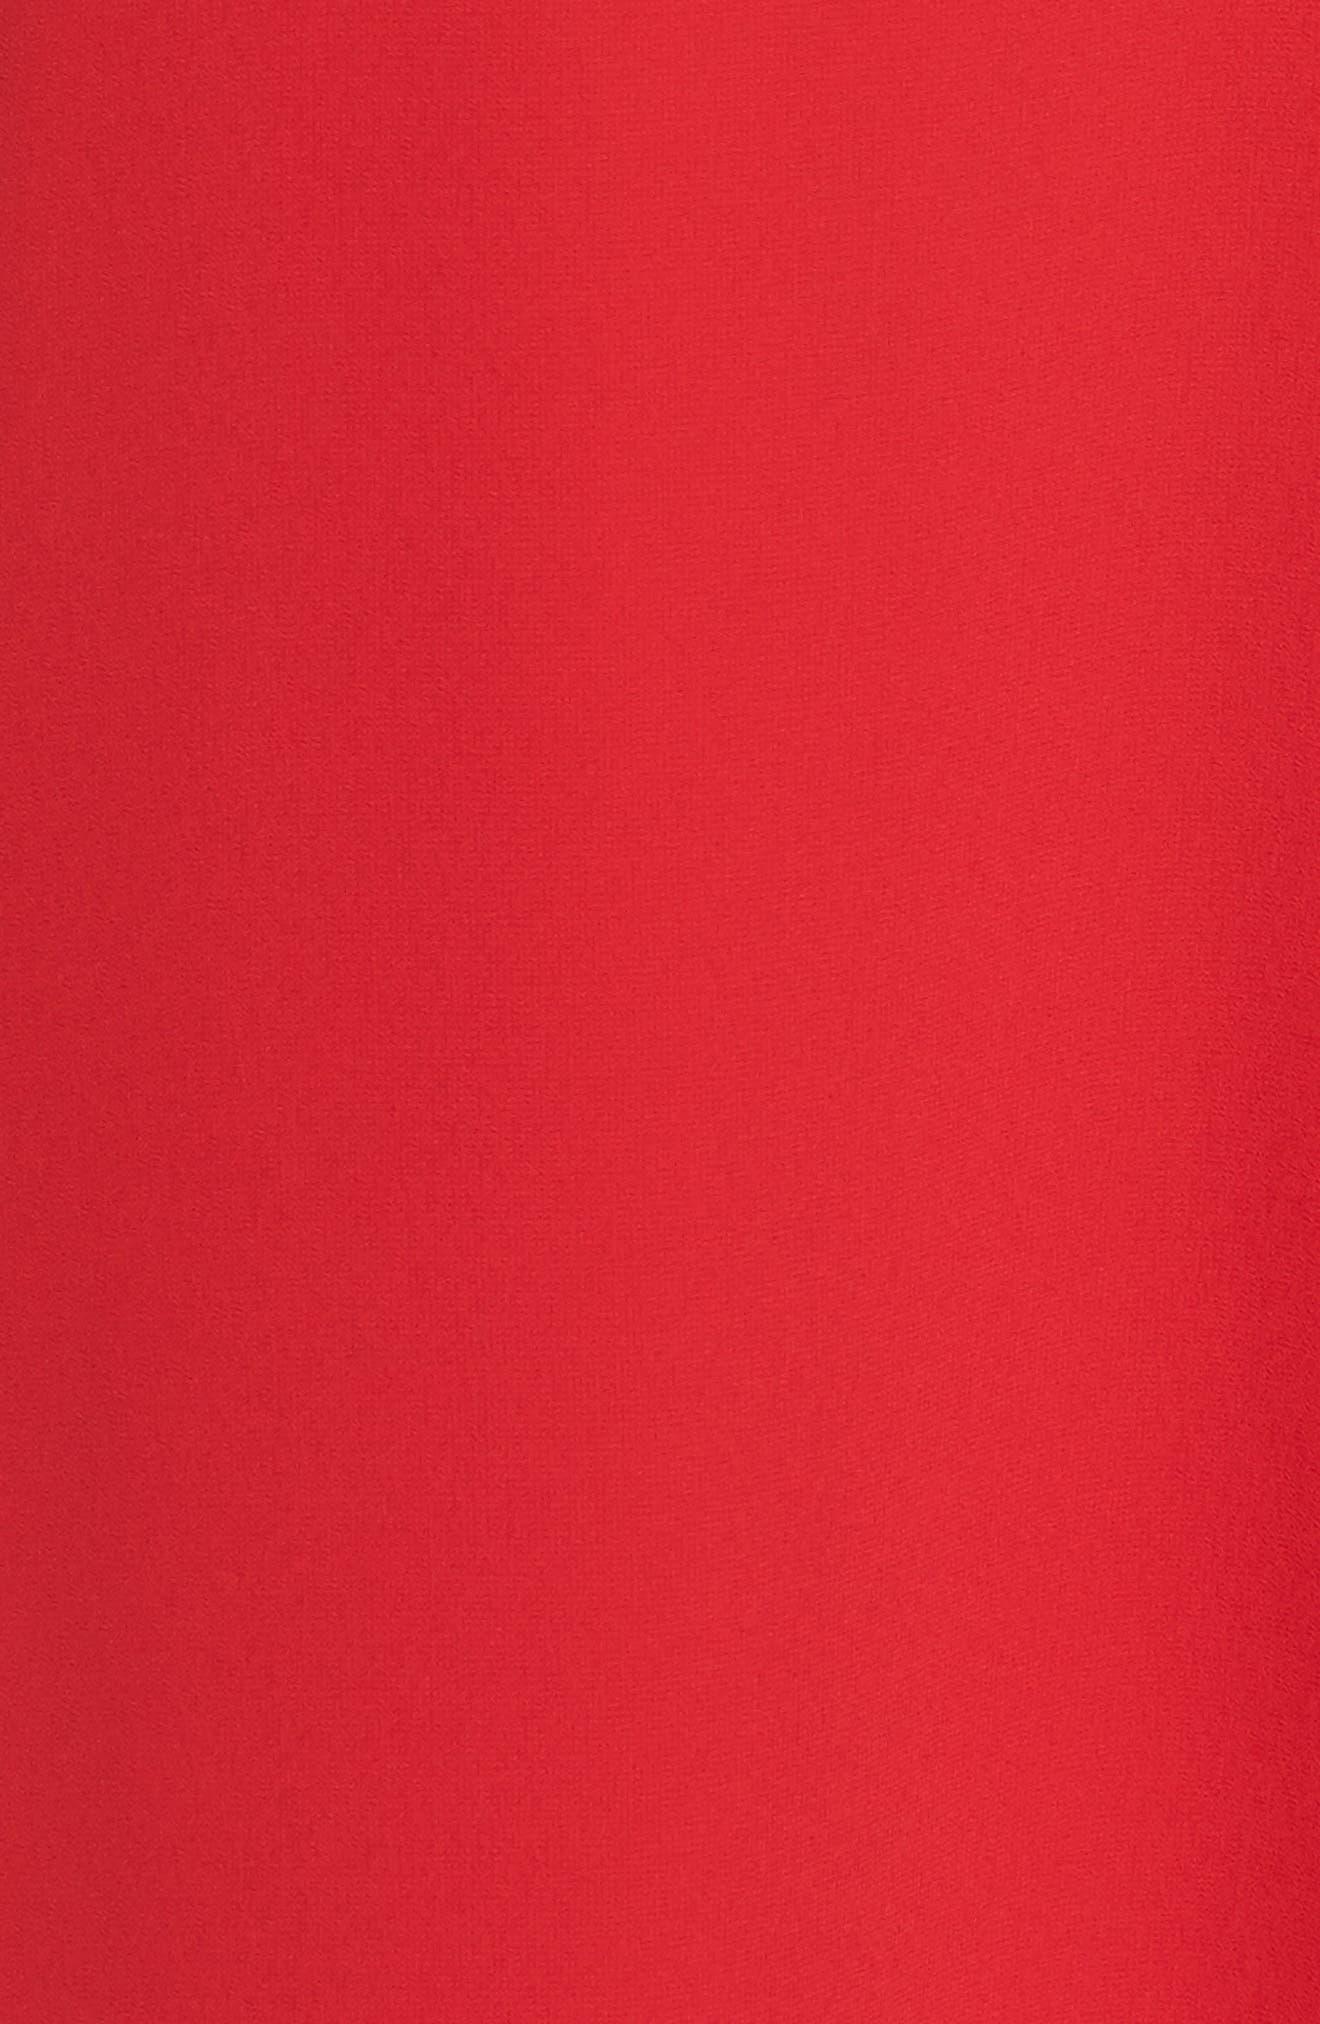 Souffle Chiffon Shift Dress,                             Alternate thumbnail 5, color,                             604